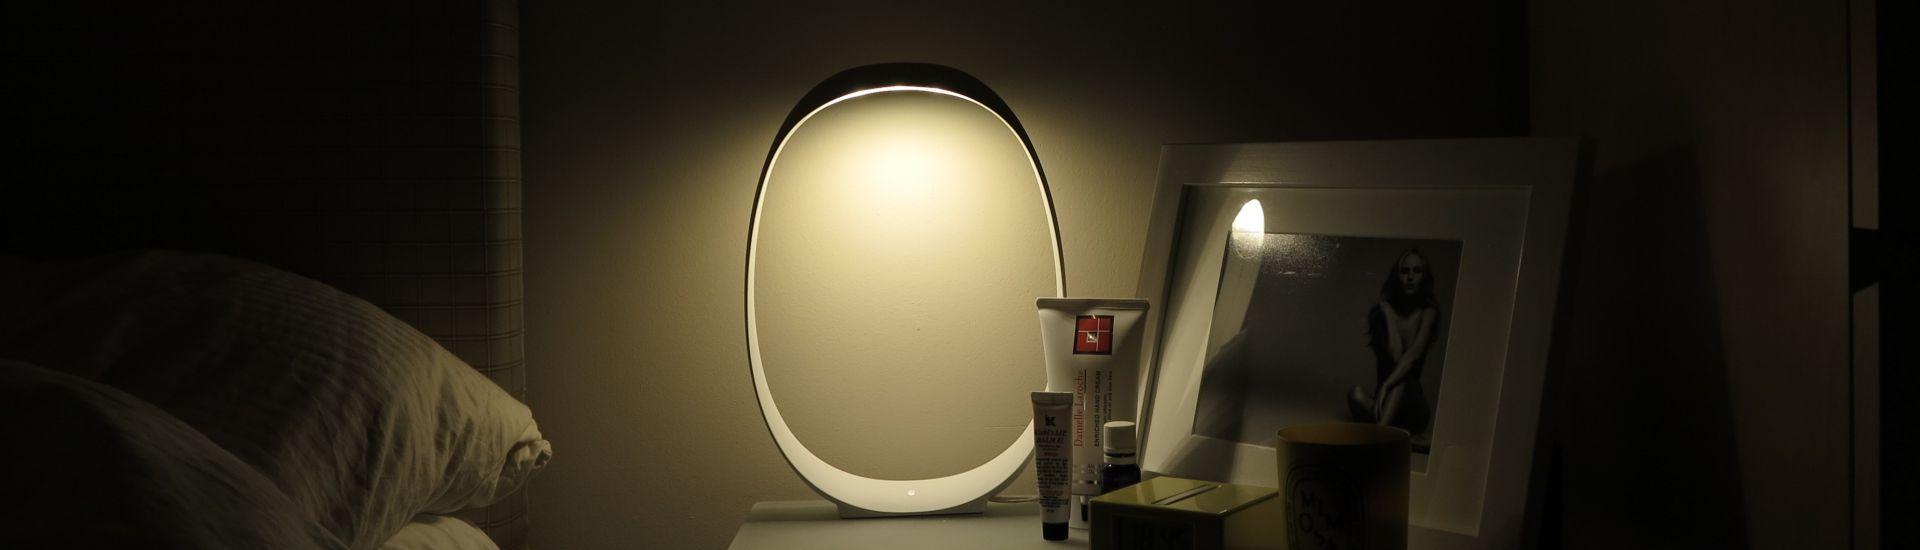 Anisha Lâmpada de mesa Grande 46cm LED 4,5w 3000K com dimmer branco